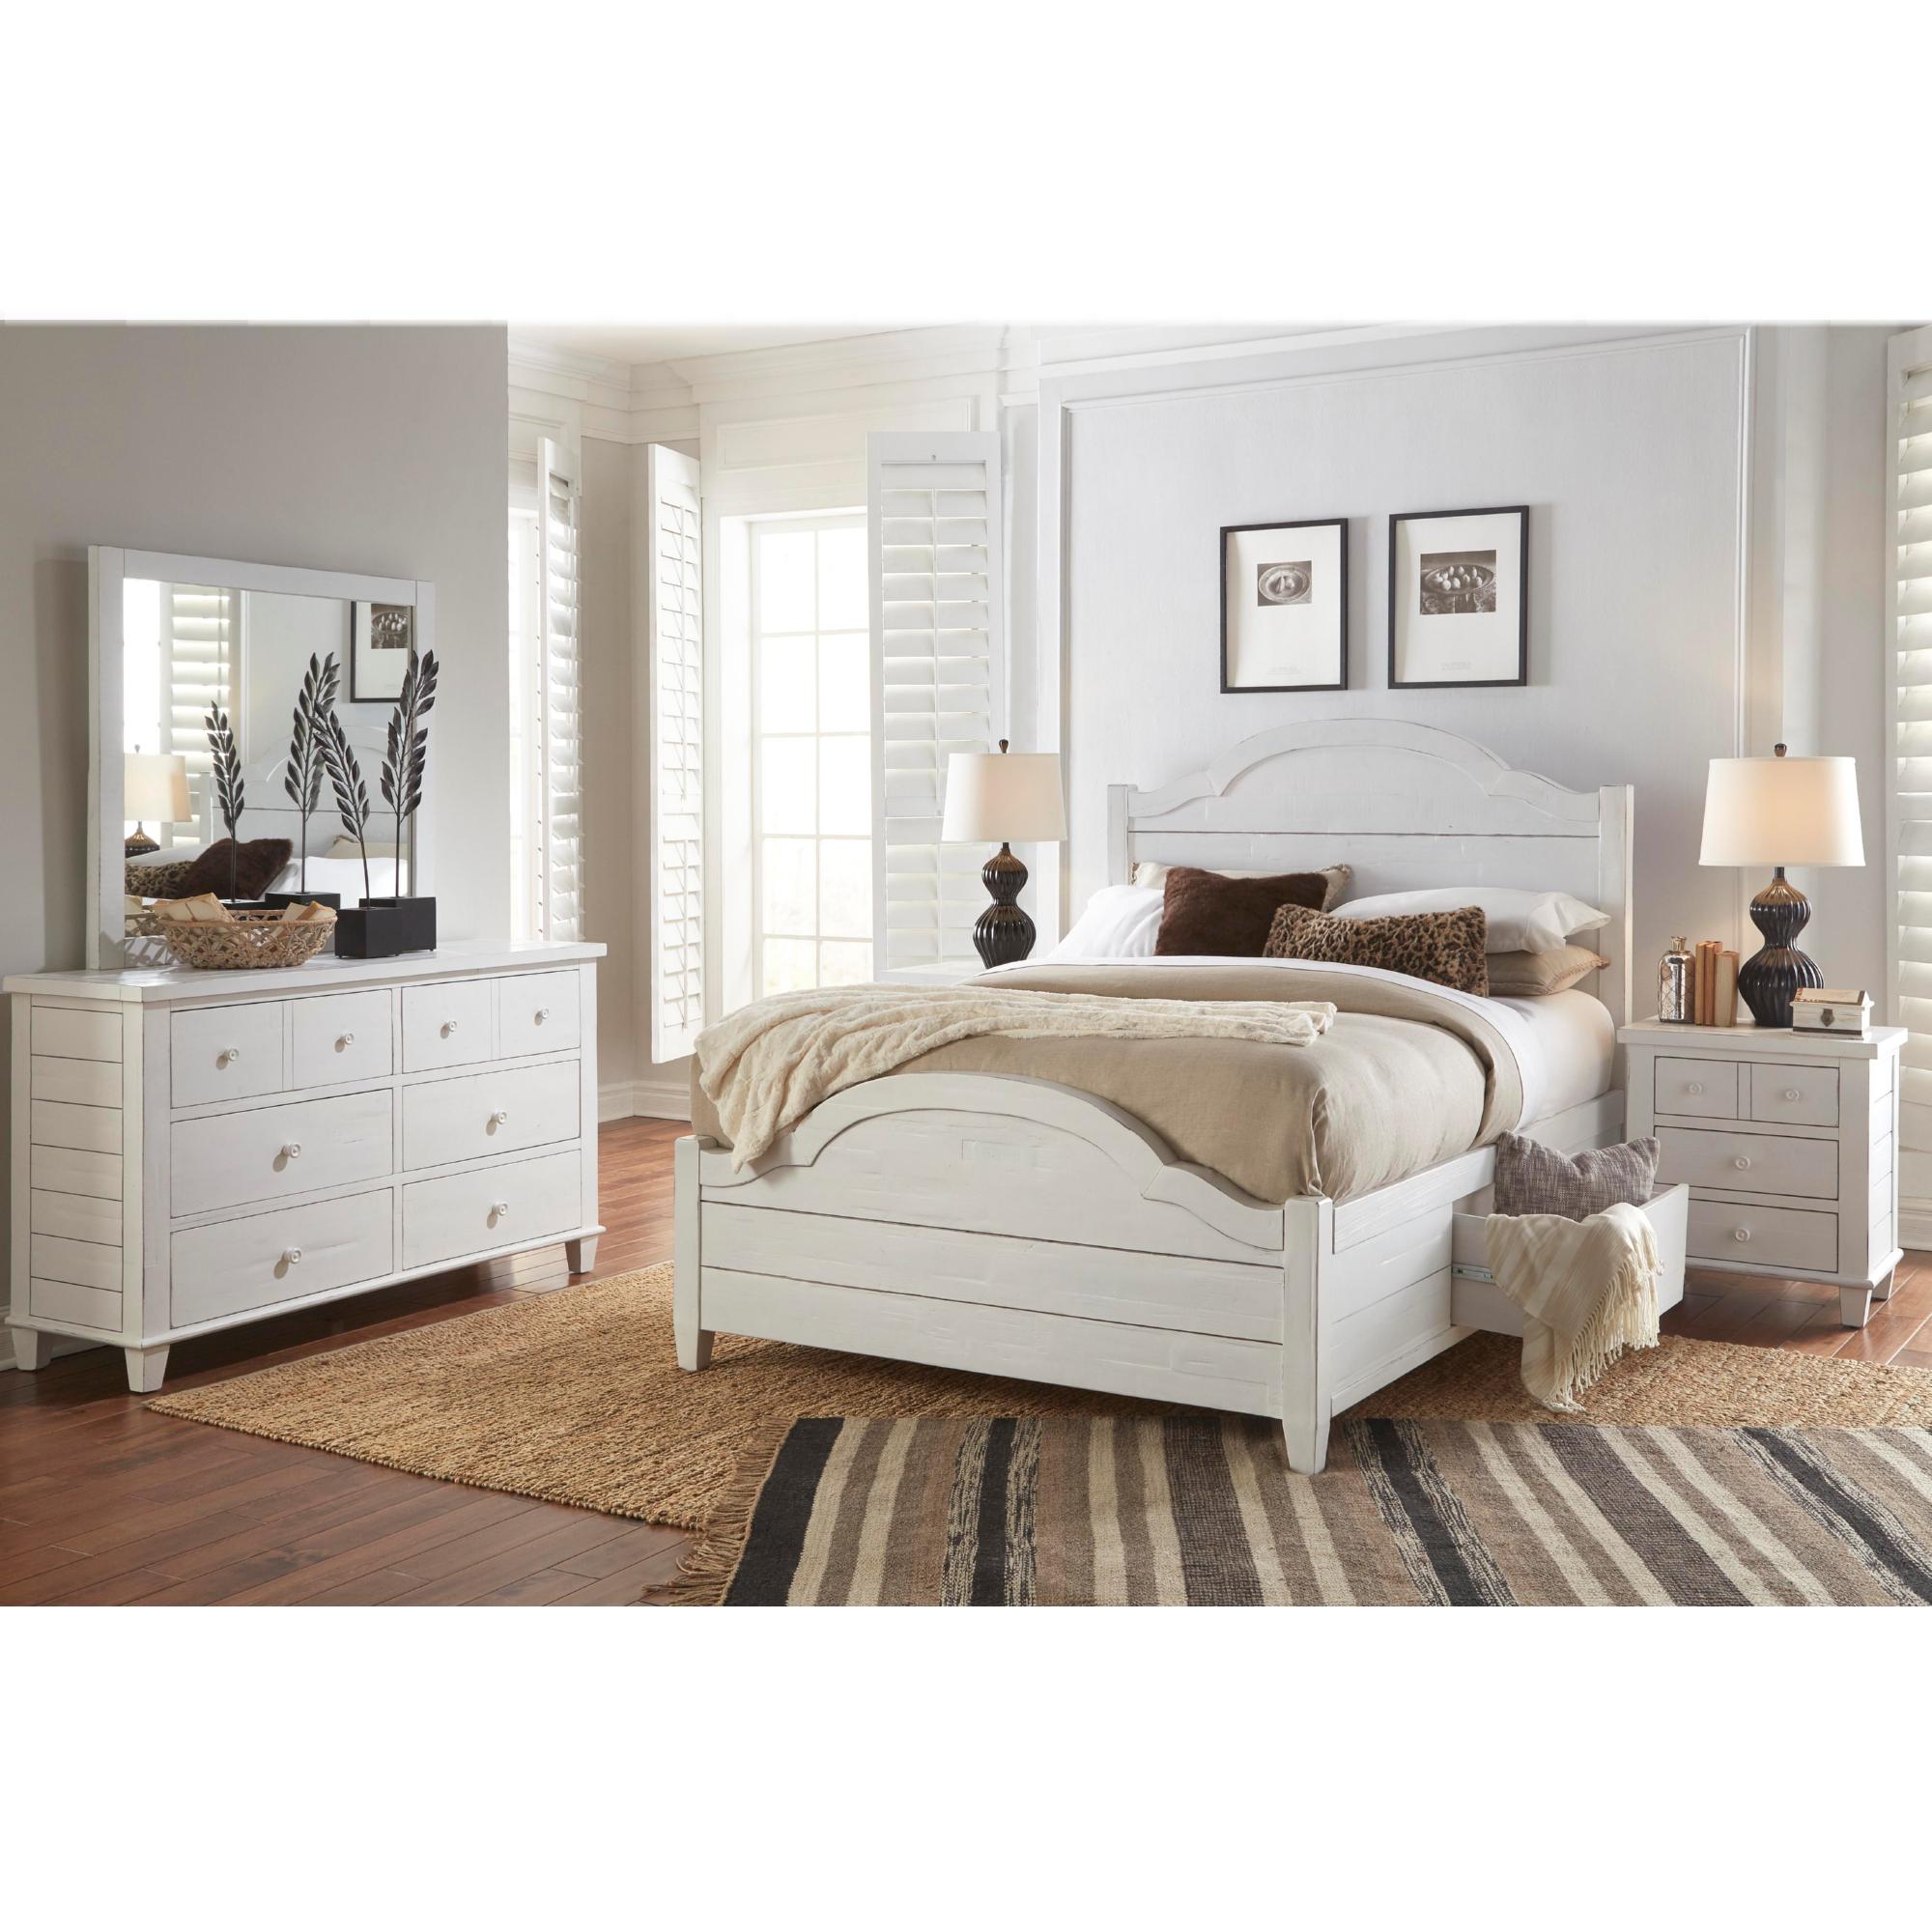 5 Piece Queen Bedroom Set In Distressed White Dynamichome Bedroom Set White Co Bedroom Furniture Stores Bedroom Sets Furniture King King Bedroom Furniture